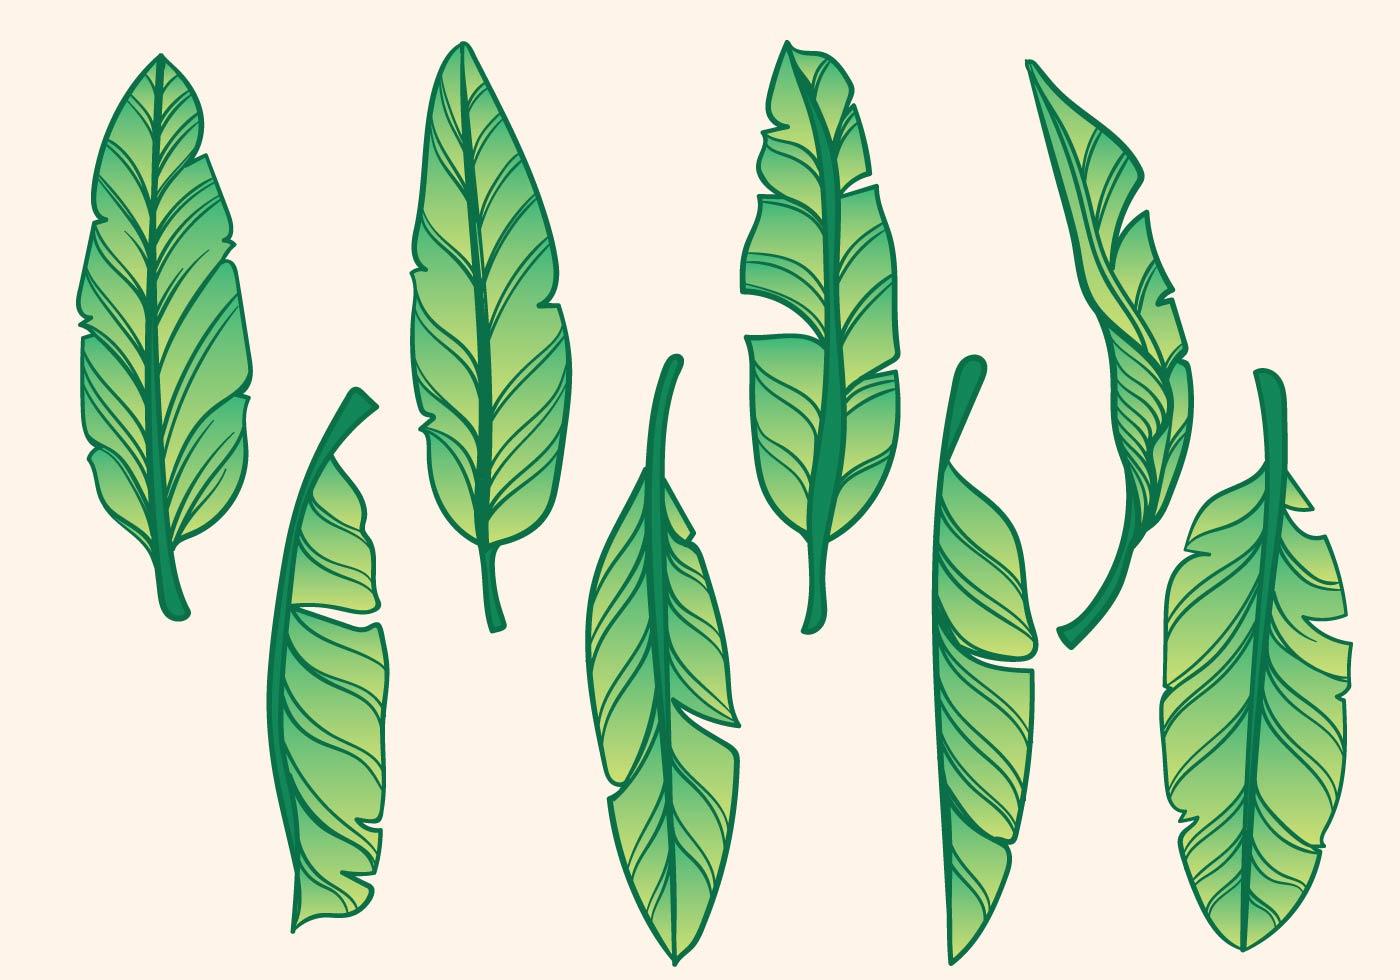 banana tree leaves vector - photo #16